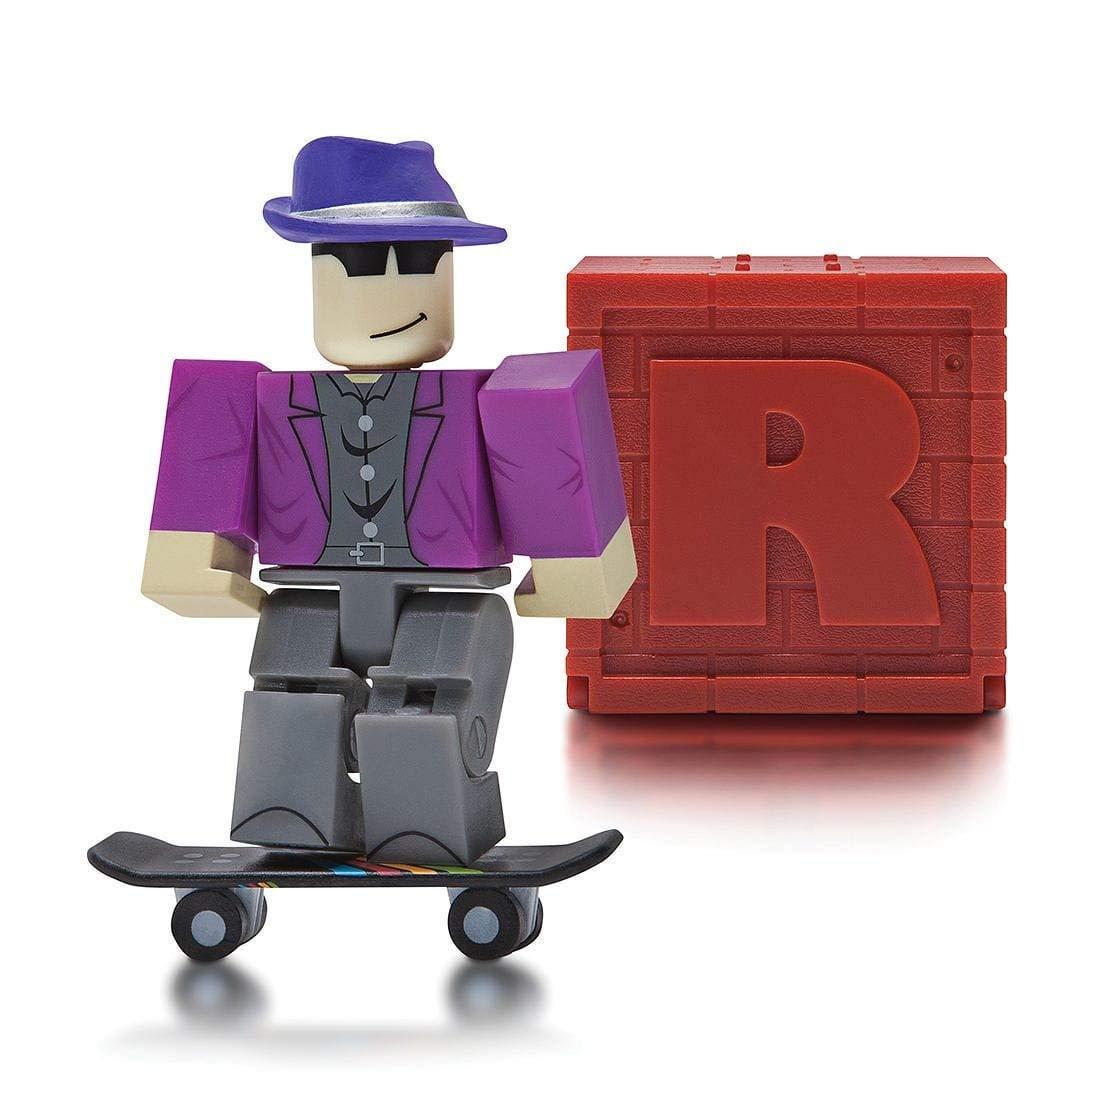 Roblox Series 4 prisman Action Figure Mystery Box Virtual Item Code 2.5 Jazwares